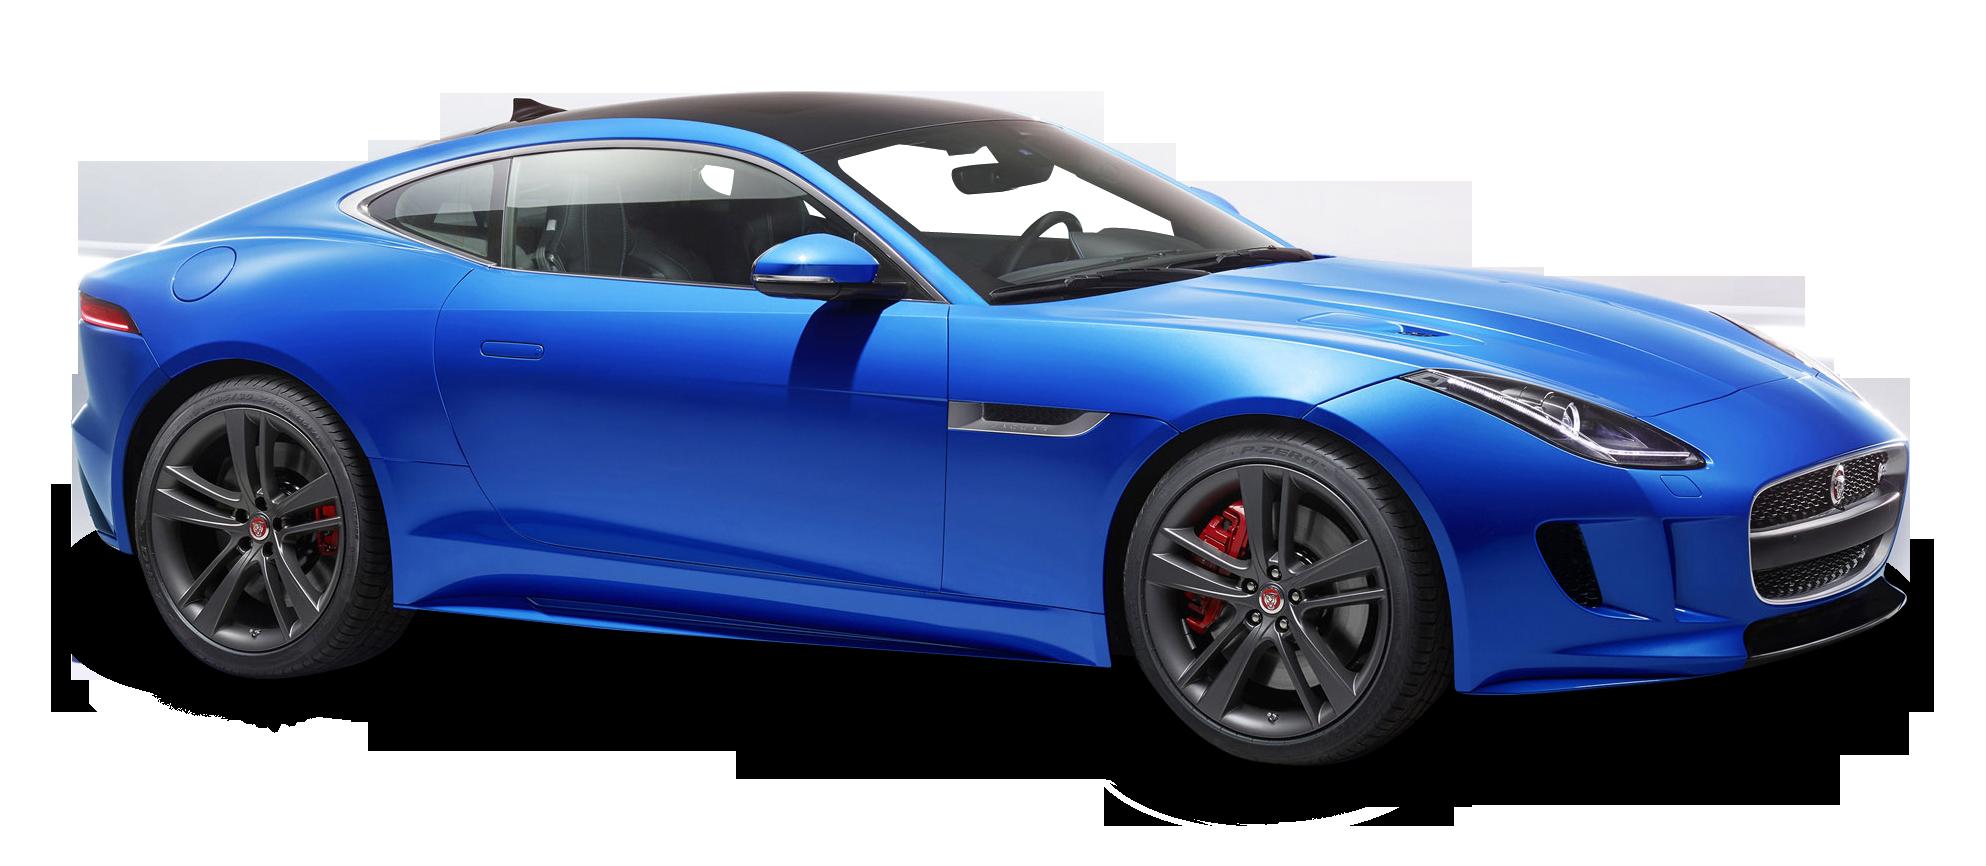 Jaguar F Type Luxury Sports Blue Car Png Image Jaguar F Type Blue Car Jaguar